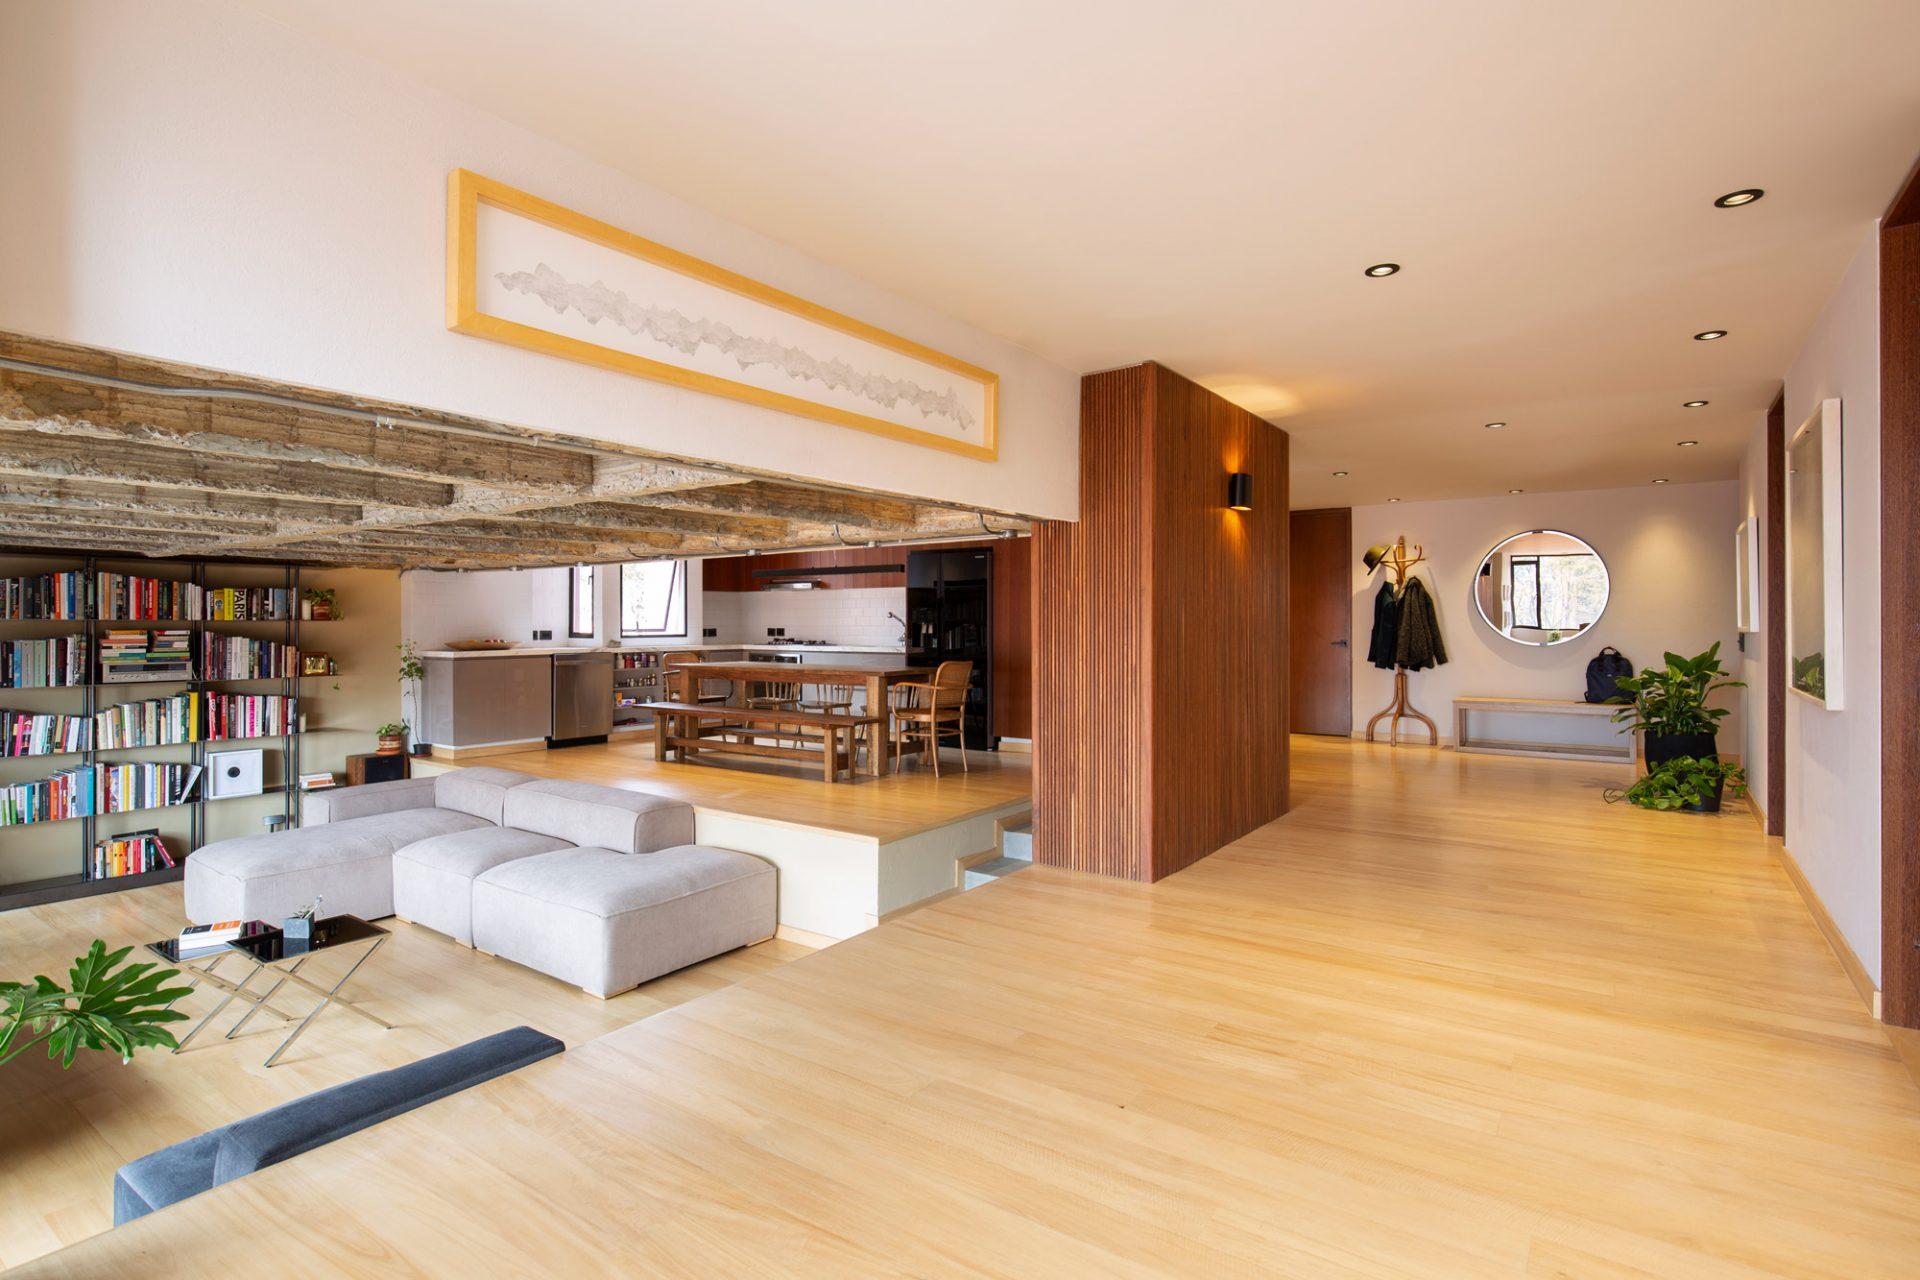 04.MLS_arquitectura_taller_tragaluz_interior_dutch_bogota_colombia_simon_bosch_photography